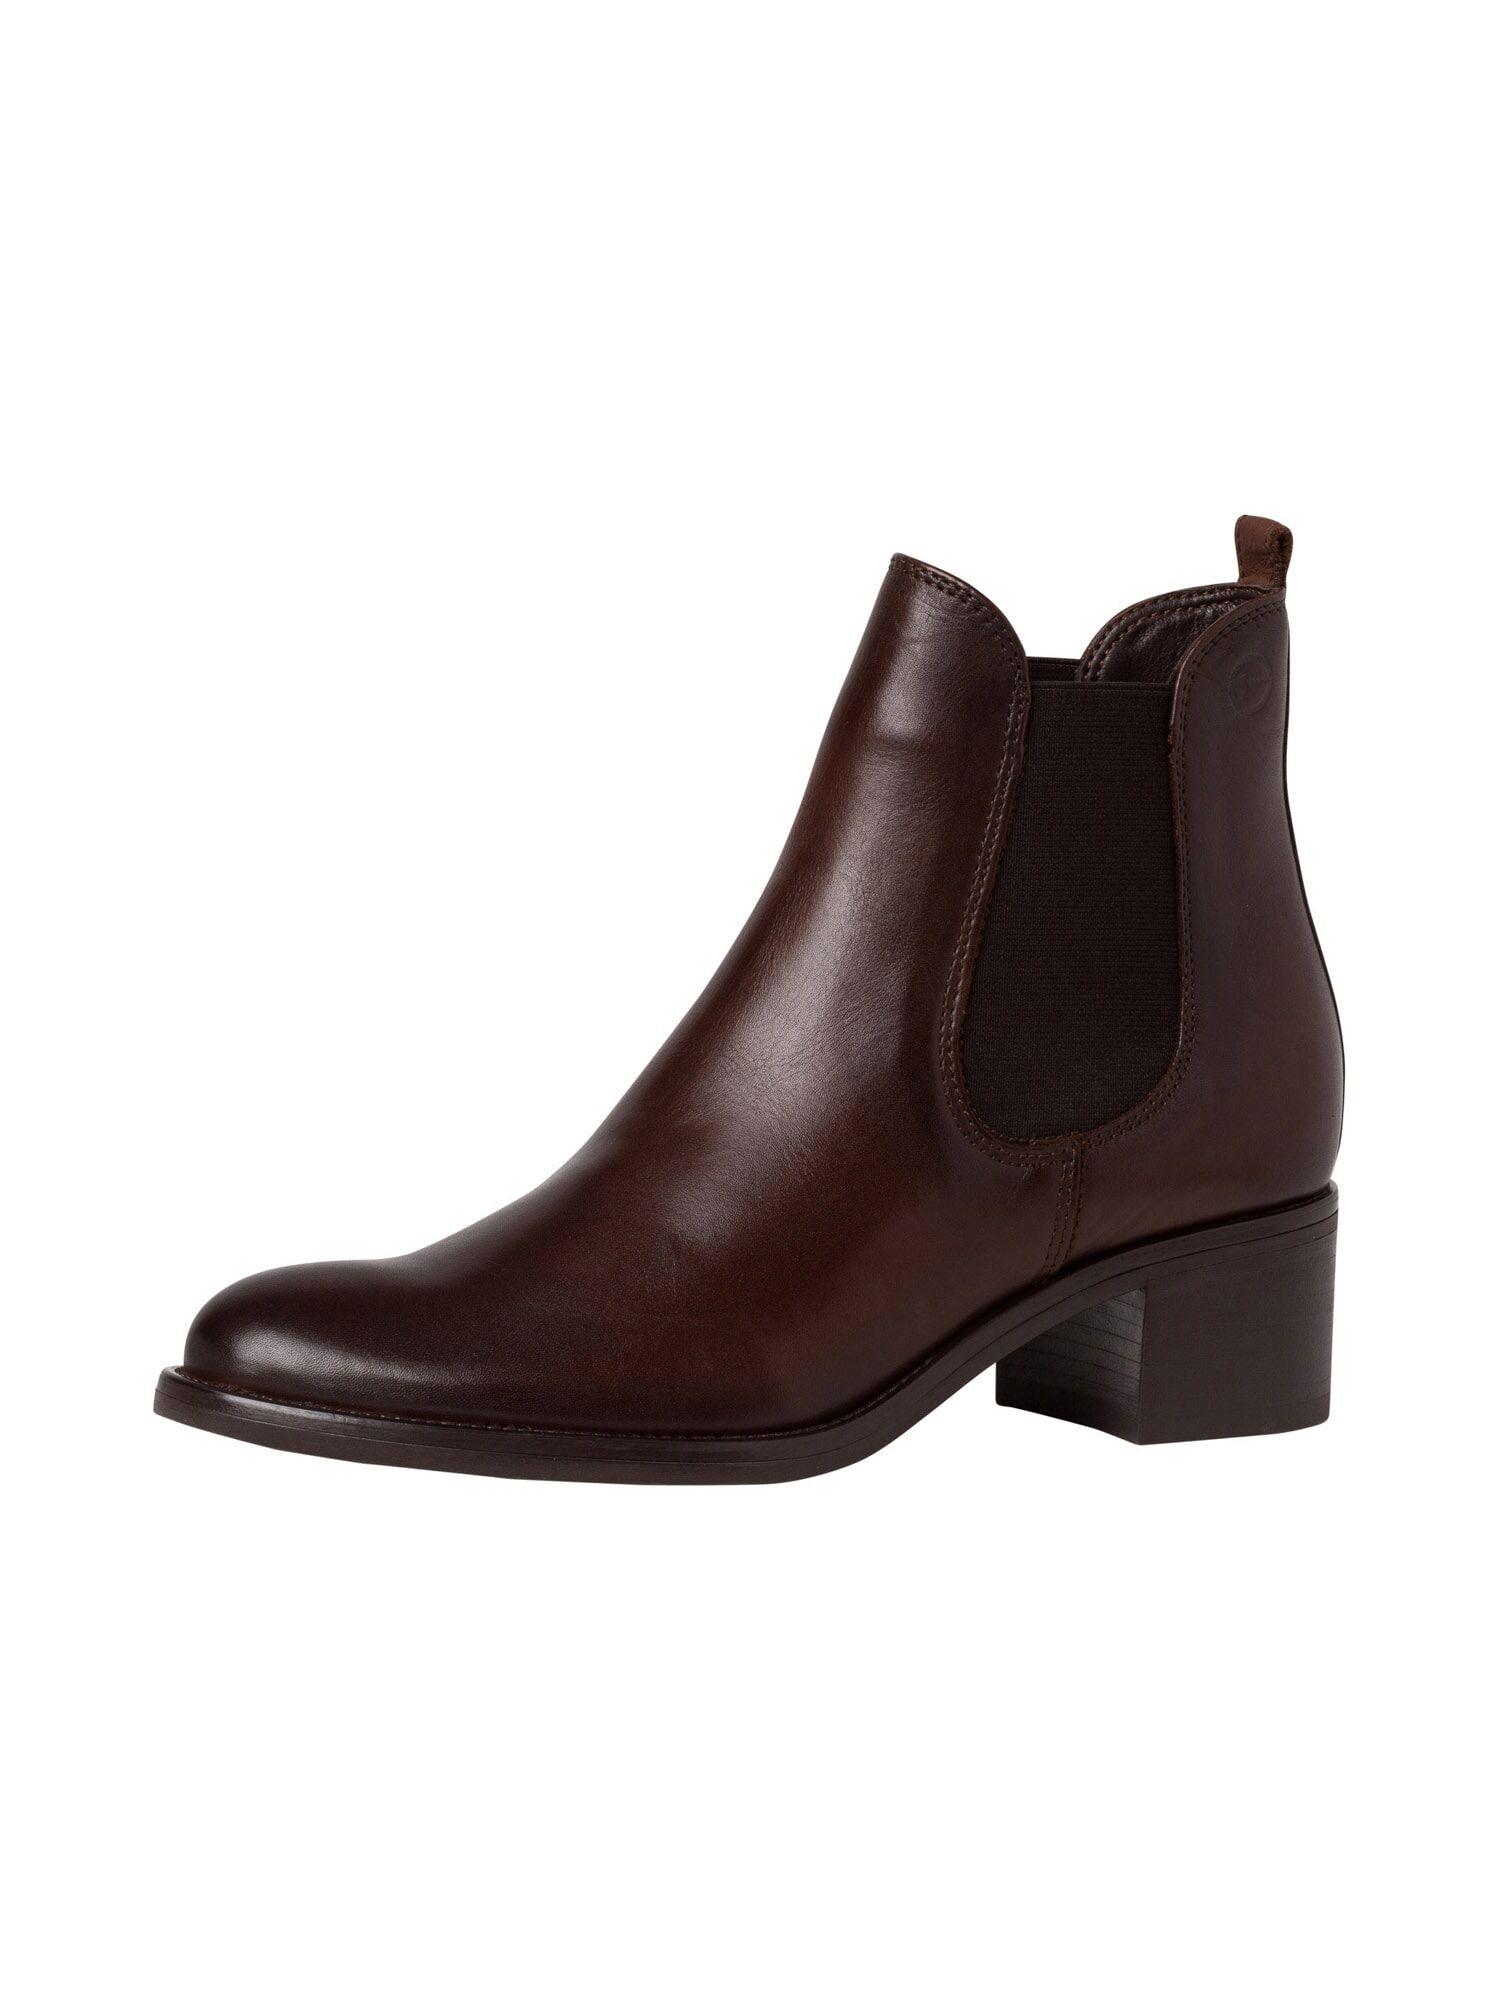 TAMARIS Chelsea Boots  - Marron - Taille: 41 - female